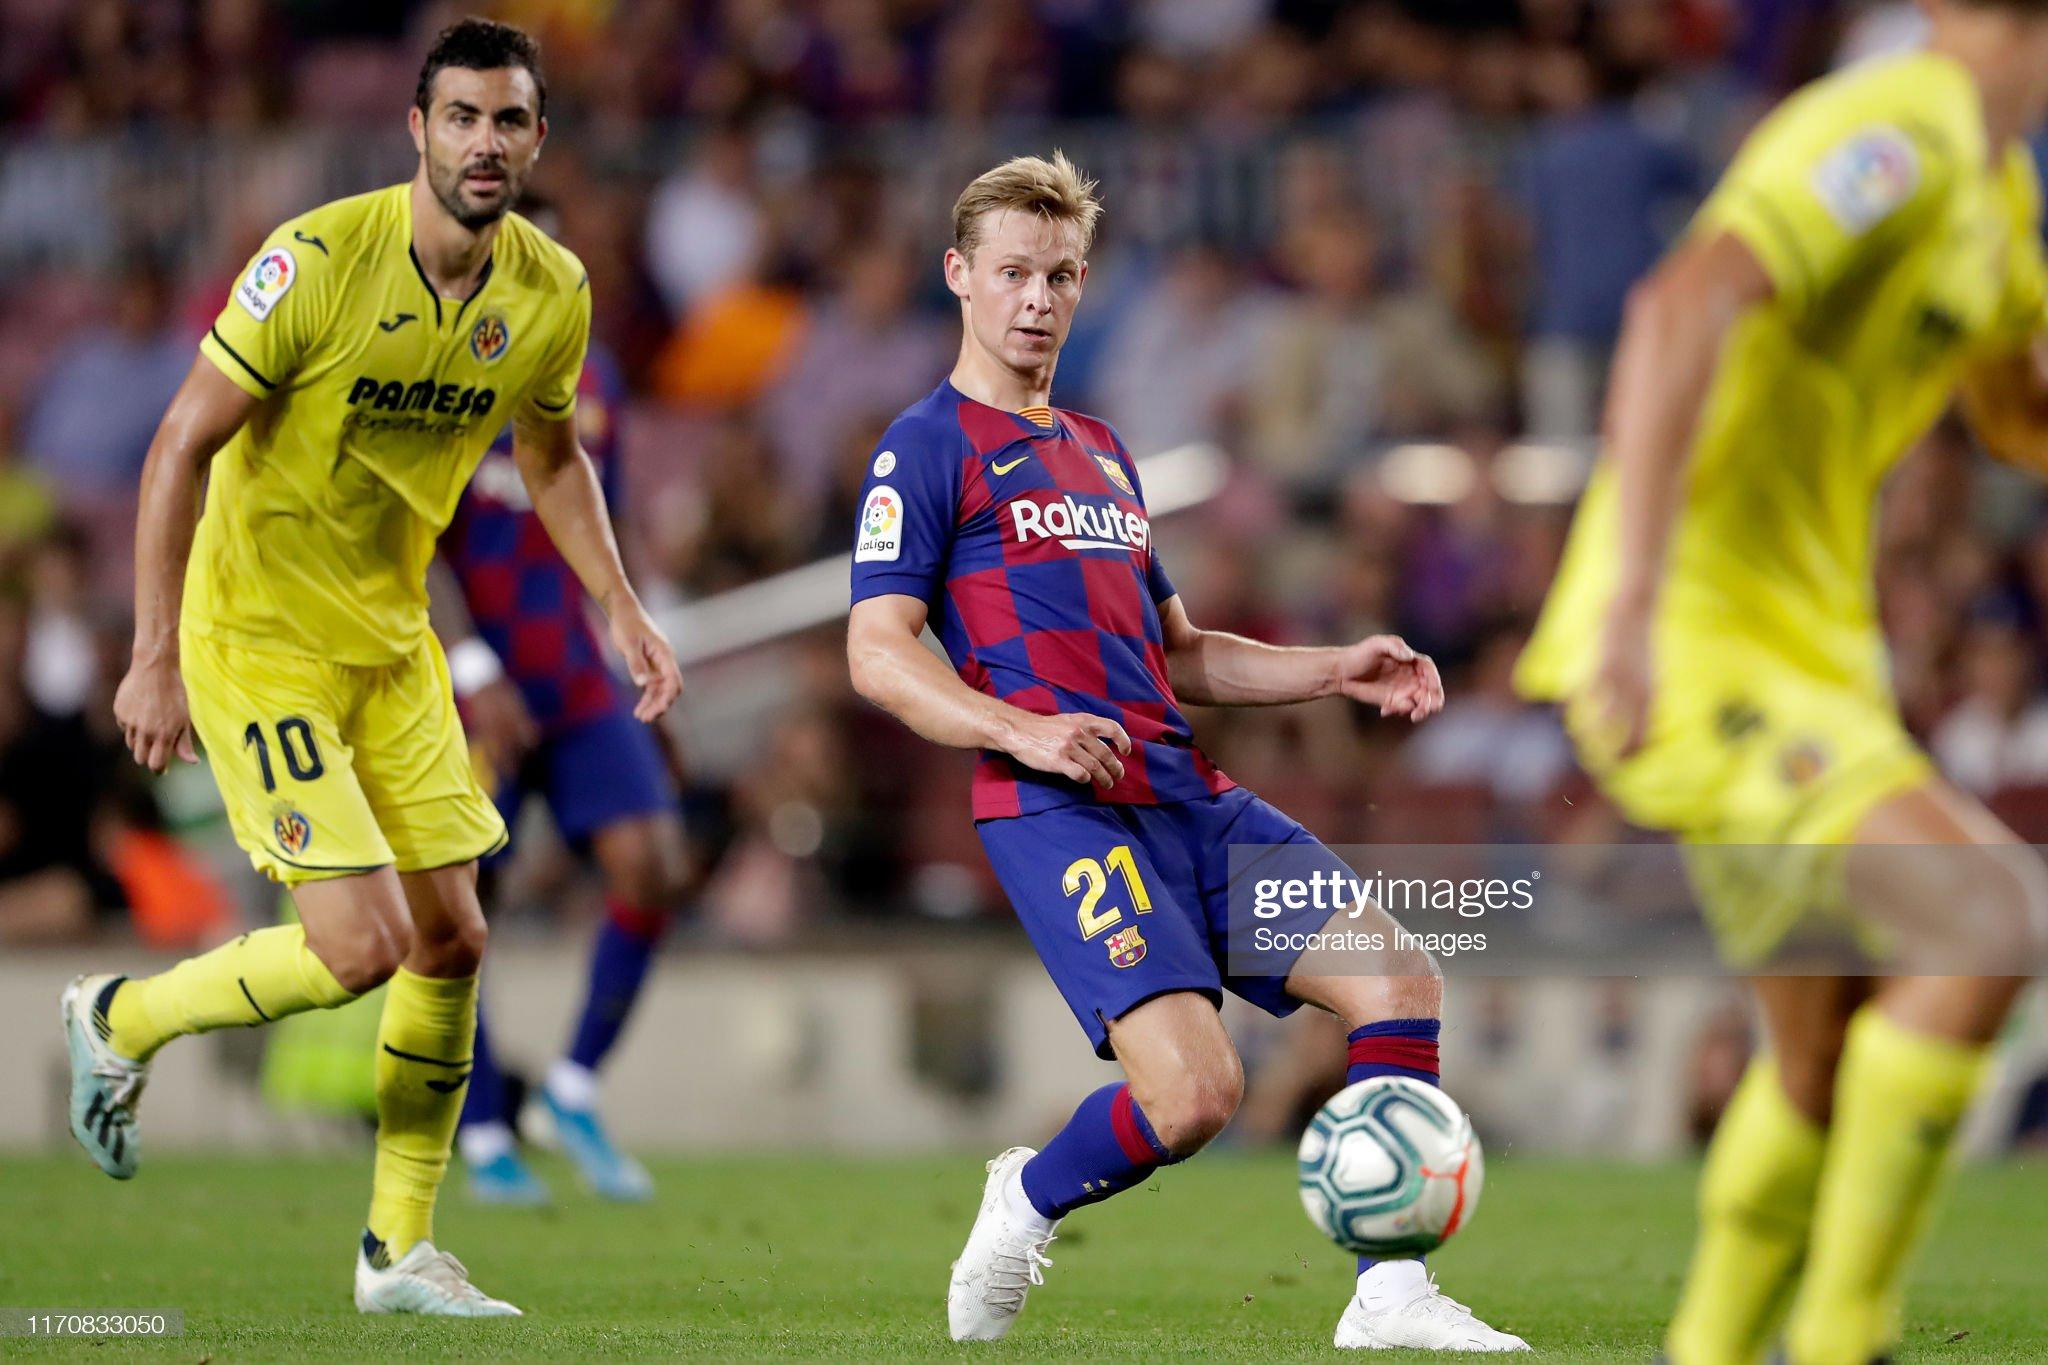 صور مباراة : برشلونة - فياريال 2-1 ( 24-09-2019 )  Frenkie-de-jong-of-fc-barcelona-during-the-la-liga-santander-match-picture-id1170833050?s=2048x2048